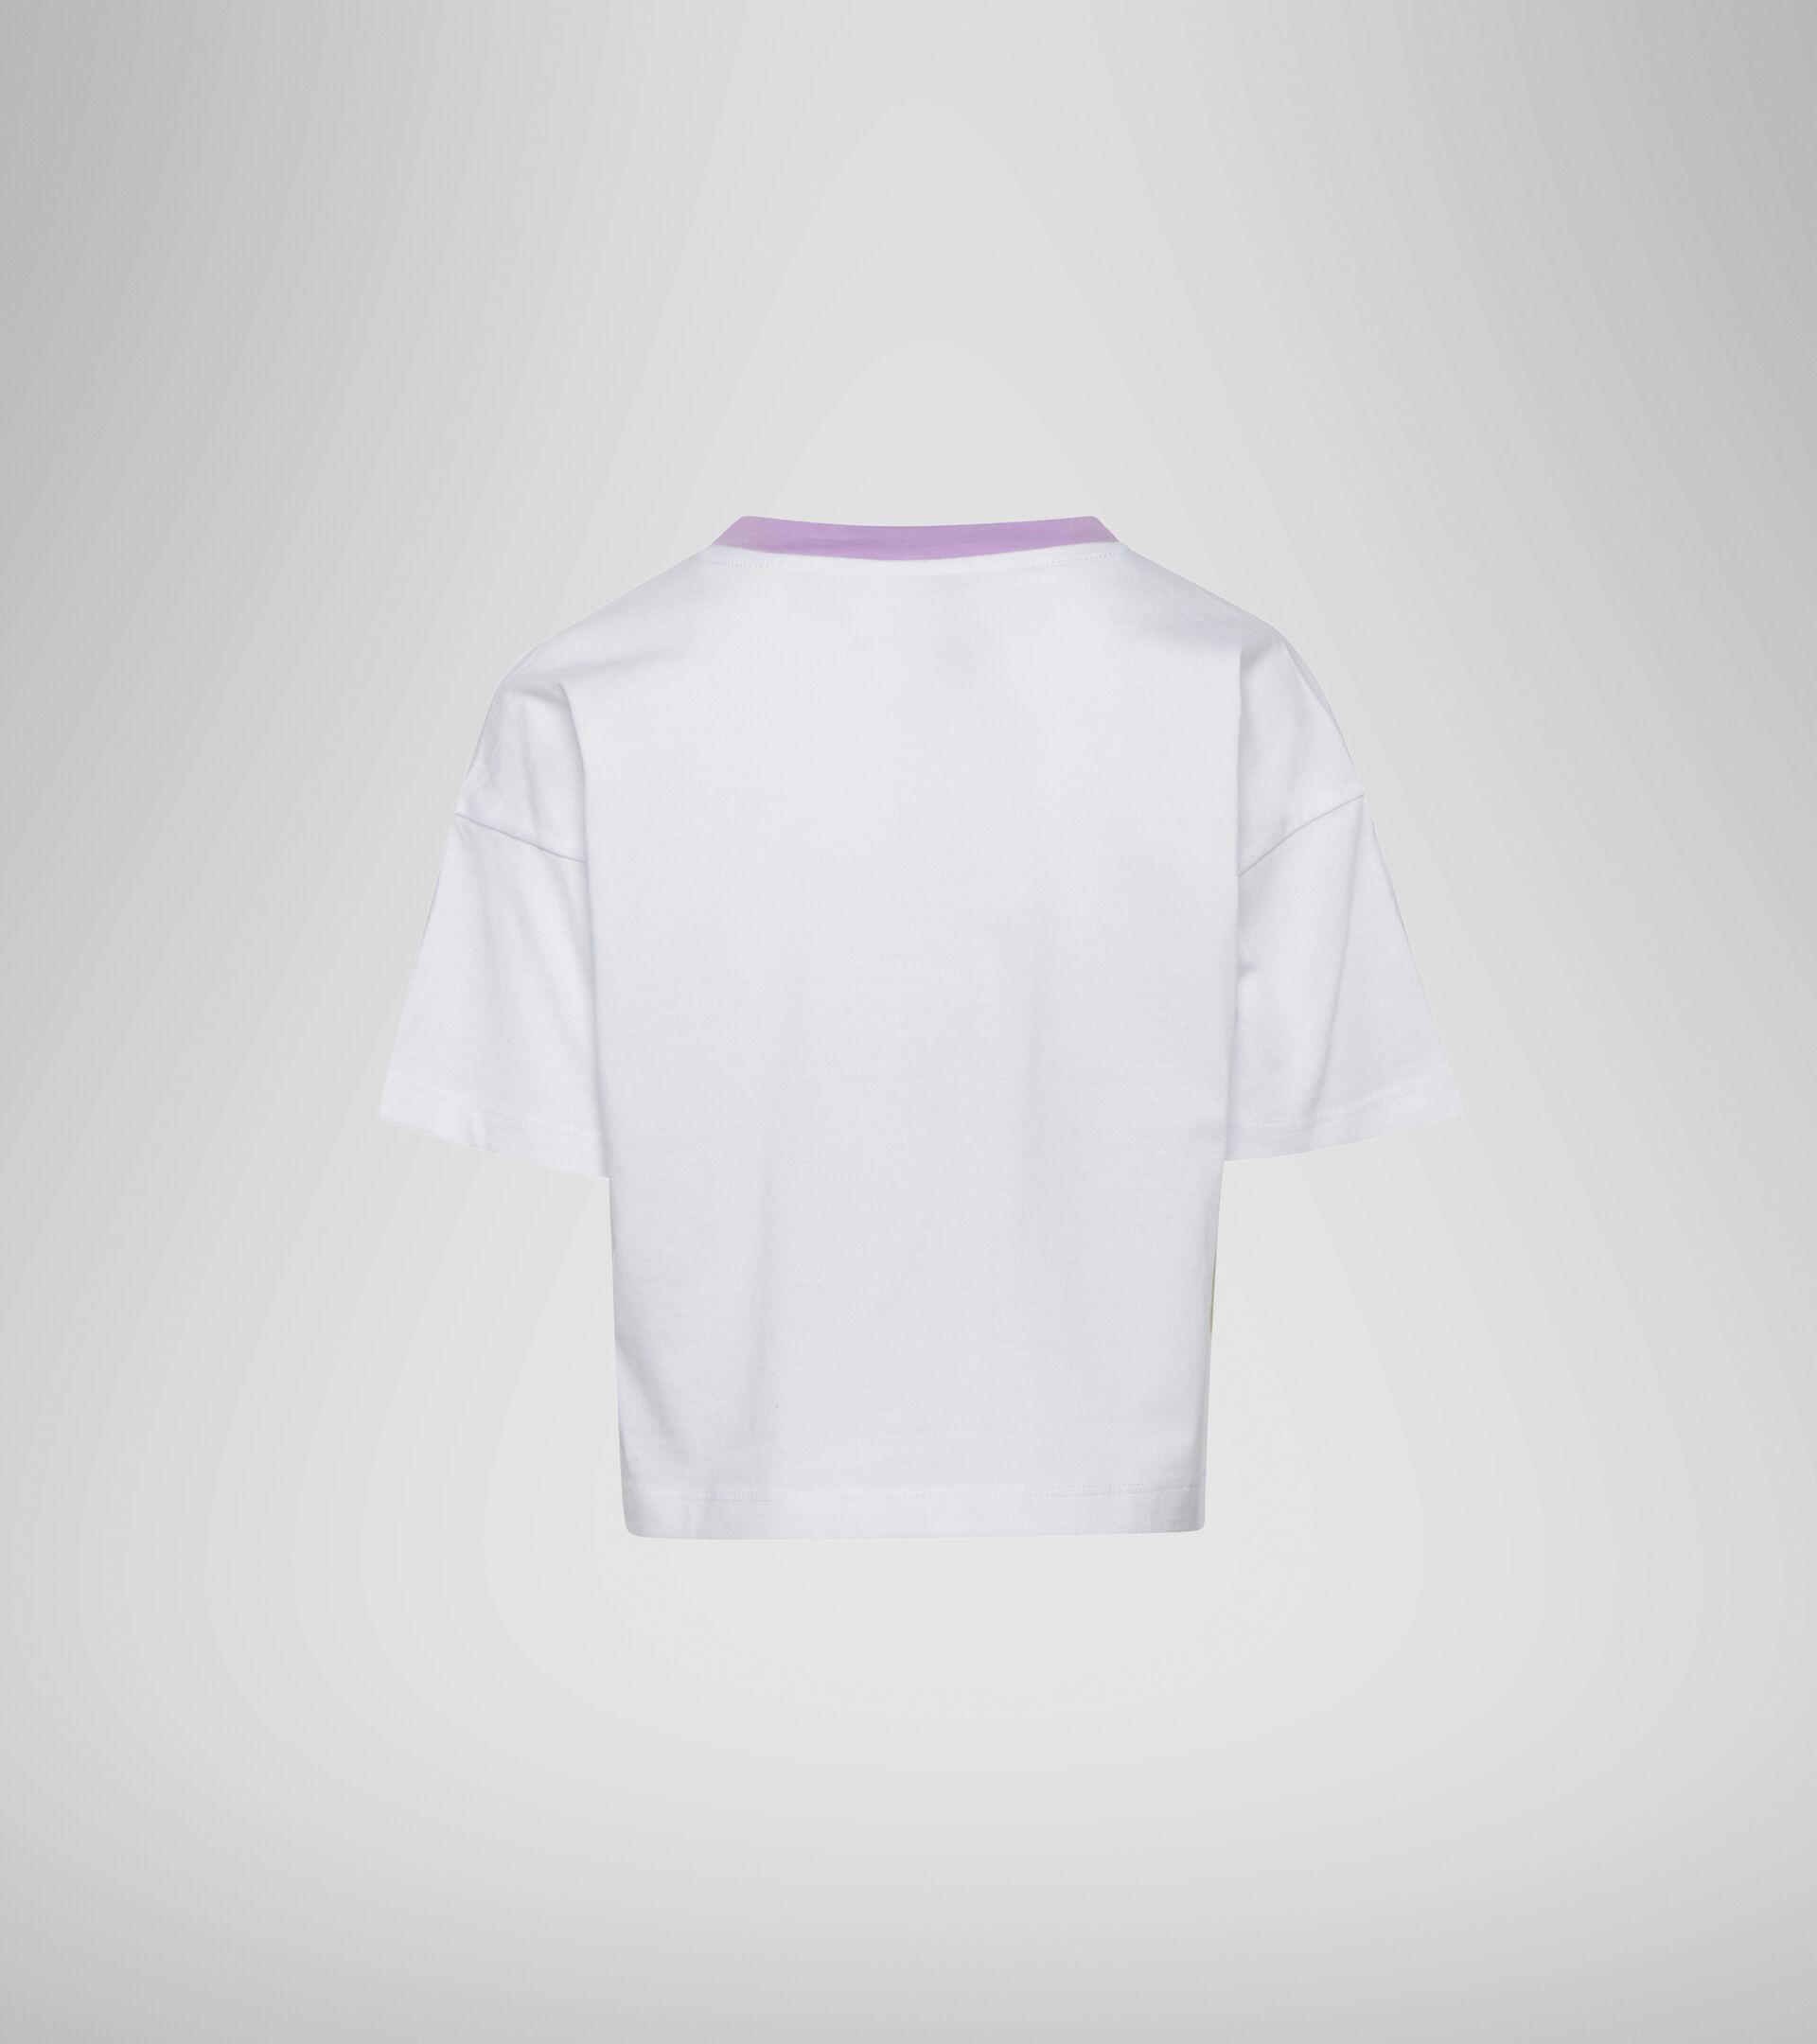 Camiseta - Niñas JG. T-SHIRT SS LOGO MANIA BLANCO VIVO - Diadora